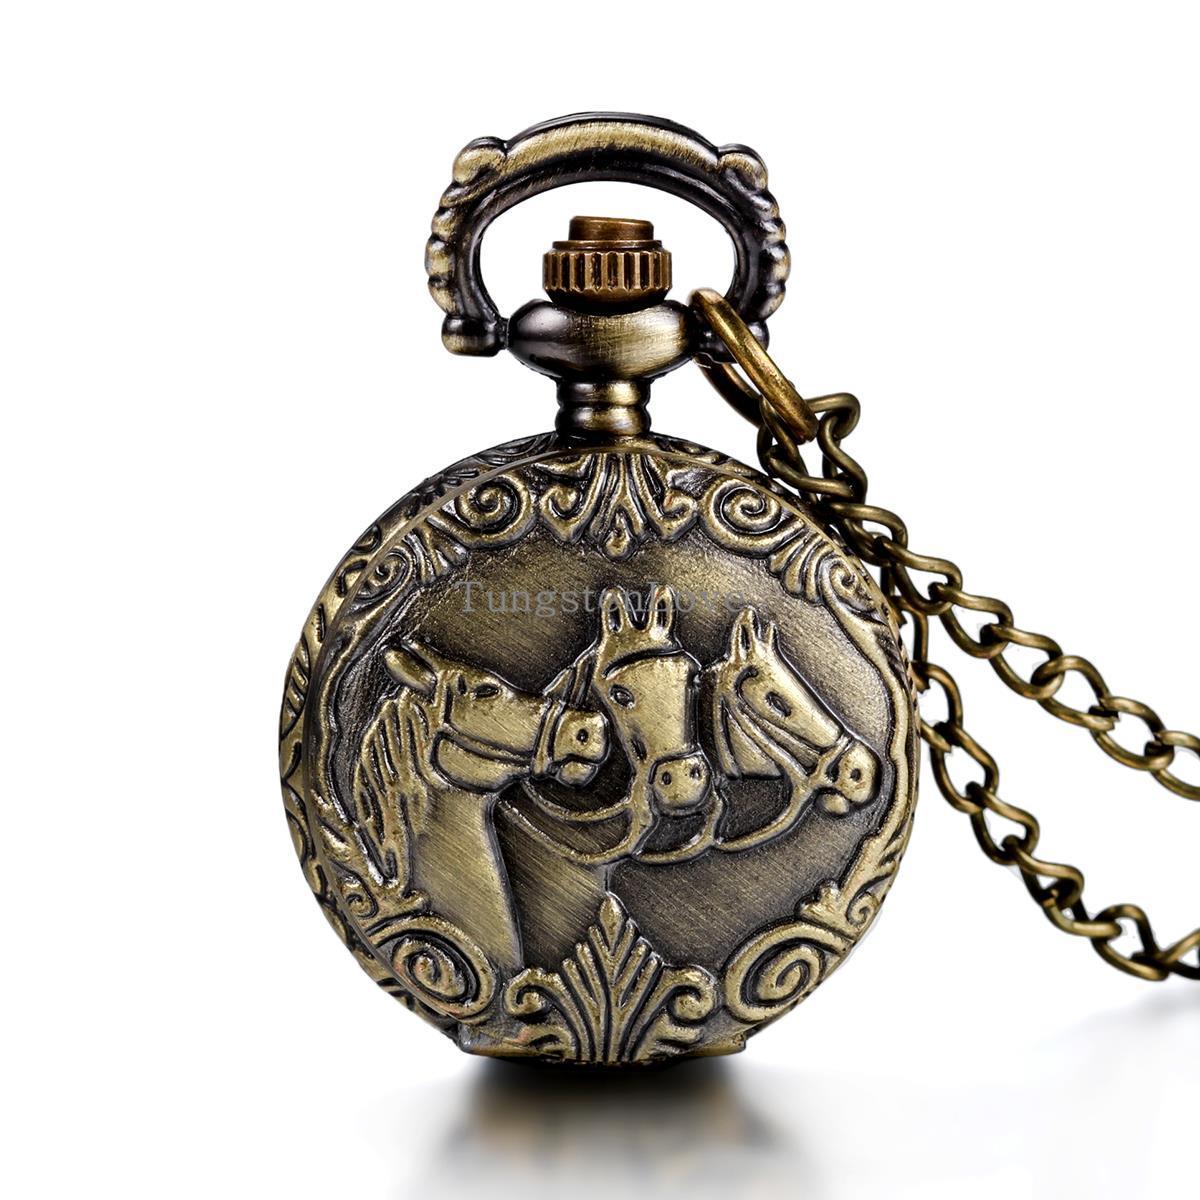 Antique Style Horses Locket Pocket Watch Quartz White Dial Arabic Numerals Full Hunter Vintage Design 80cm Chain(China (Mainland))